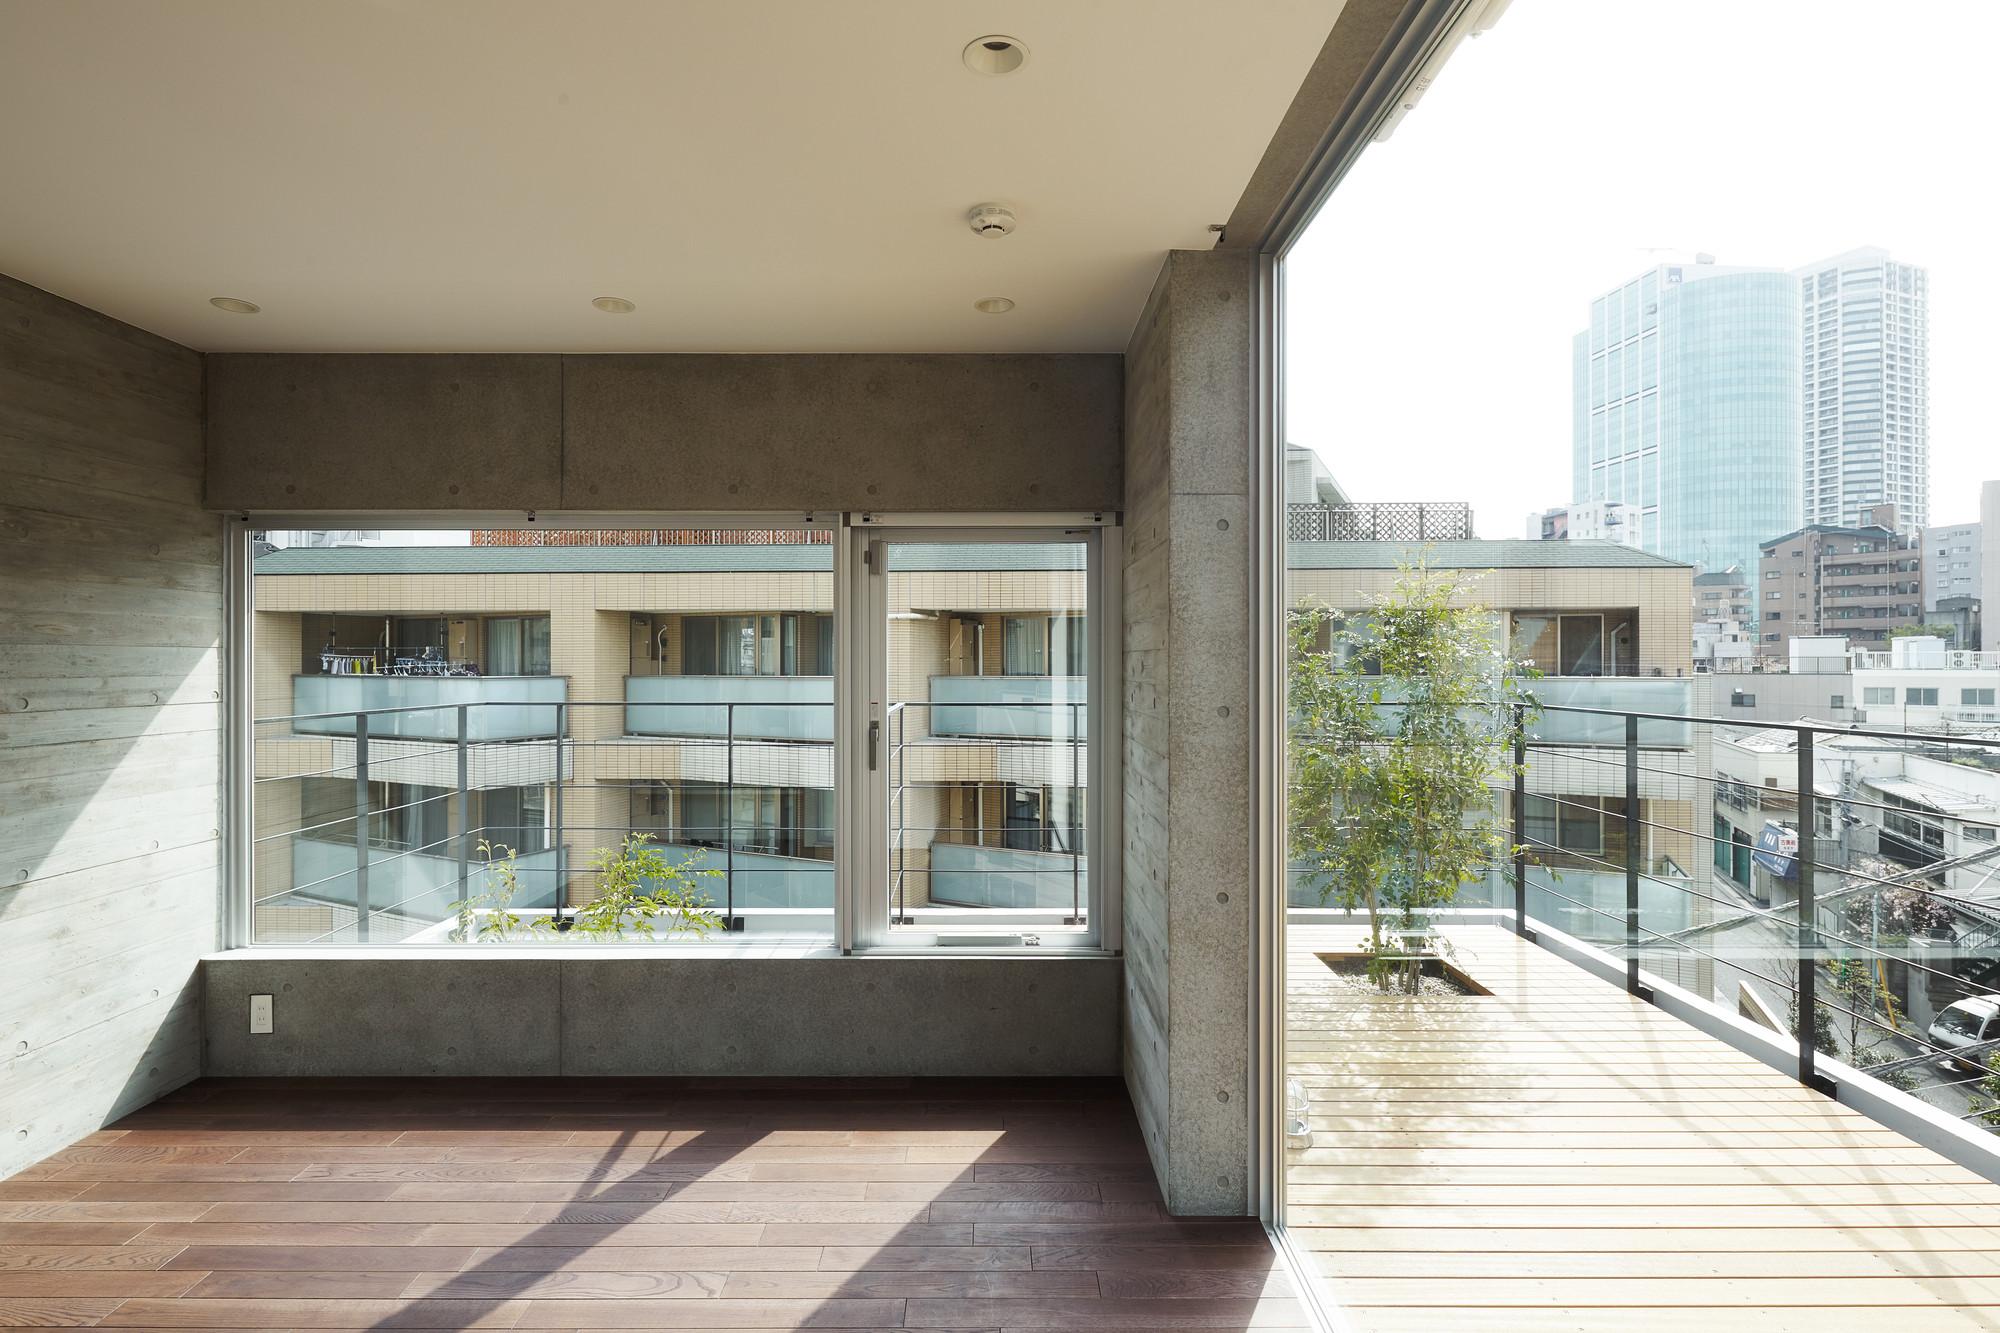 Courtesy of Ryo Matsui Architects Inc